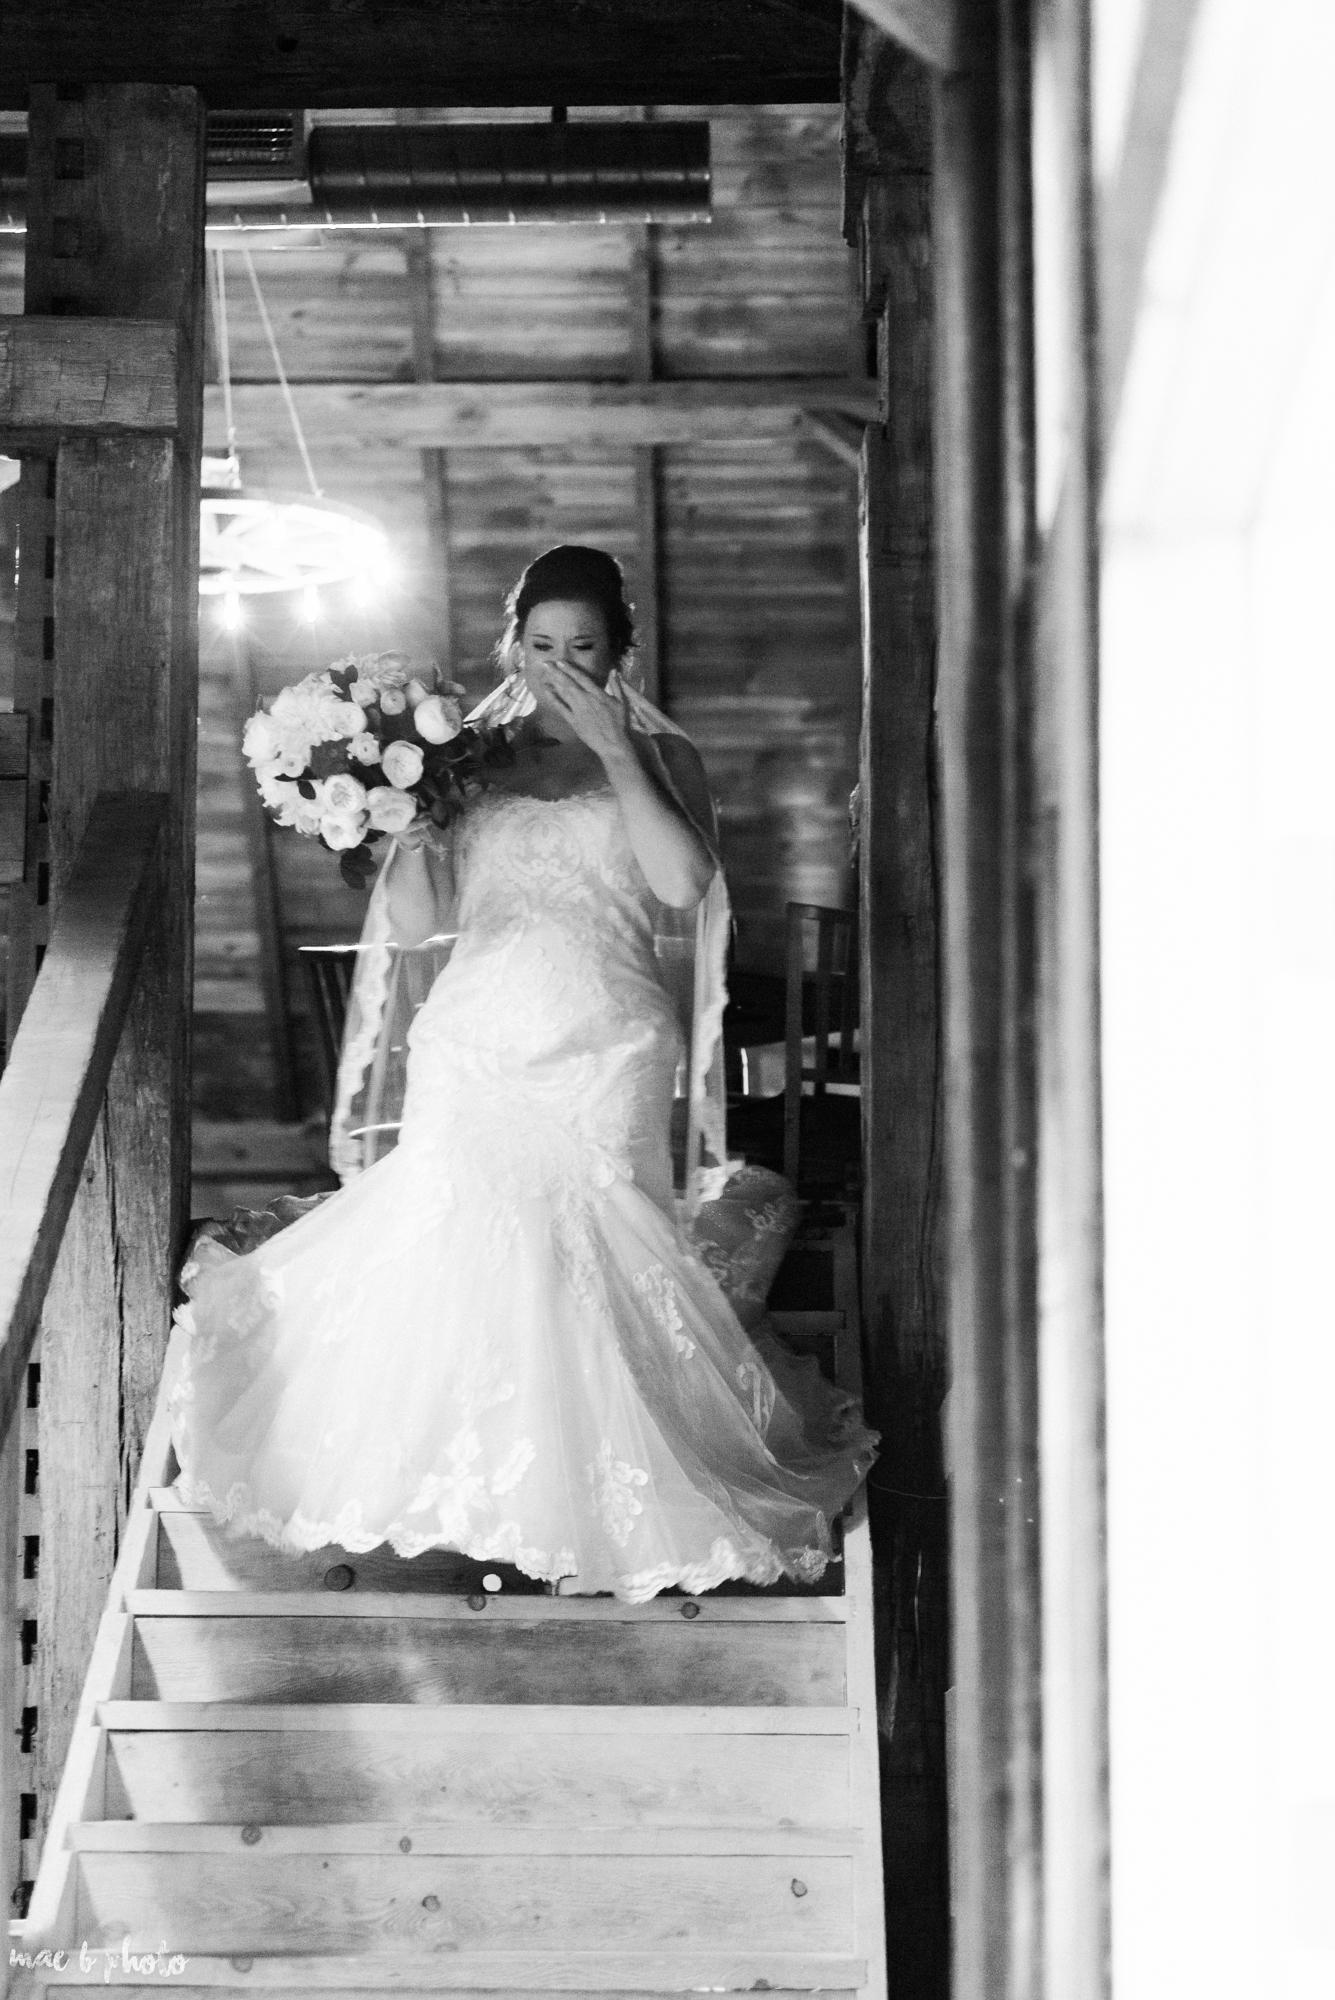 Sarah & Dustin's Rustic Chic Barn Wedding at Hartford Hill Winery in Hartford, Ohio by Mae B Photo-42.jpg